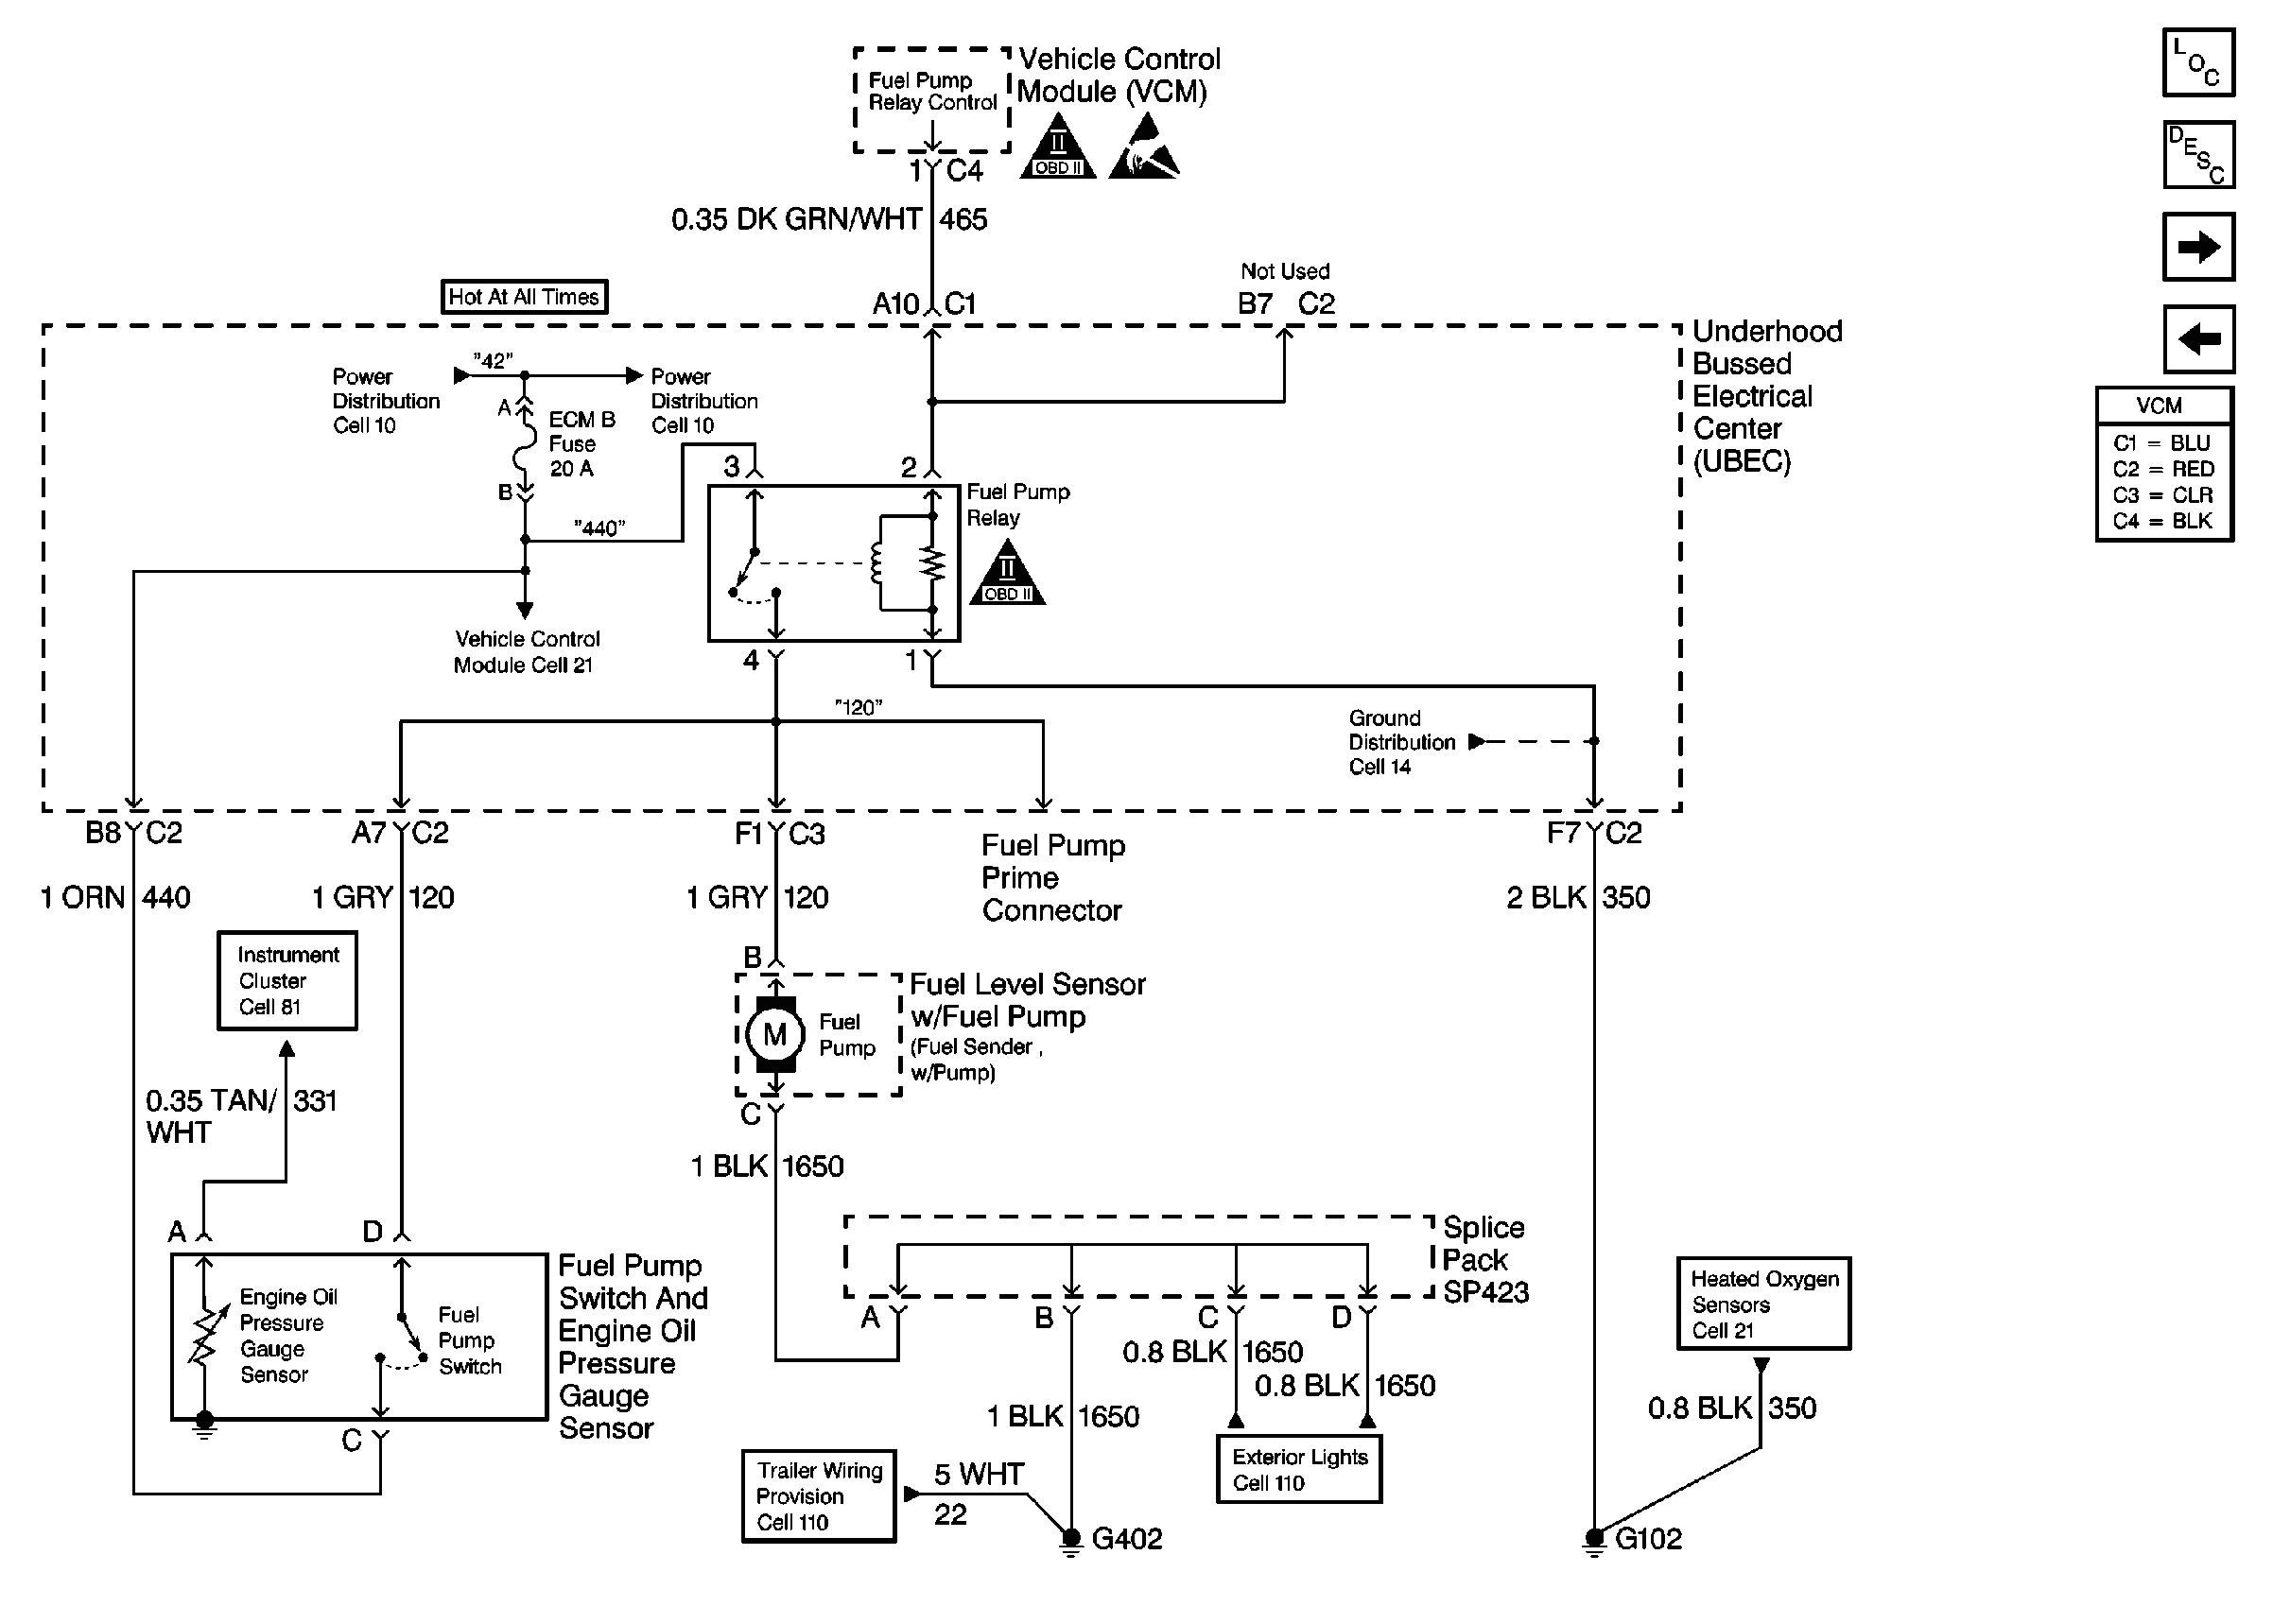 2003 trailblazer wiring harness trusted wiring diagrams u2022 rh sivamuni com 2003 trailblazer radio wiring schematic 2003 trailblazer radio wiring schematic